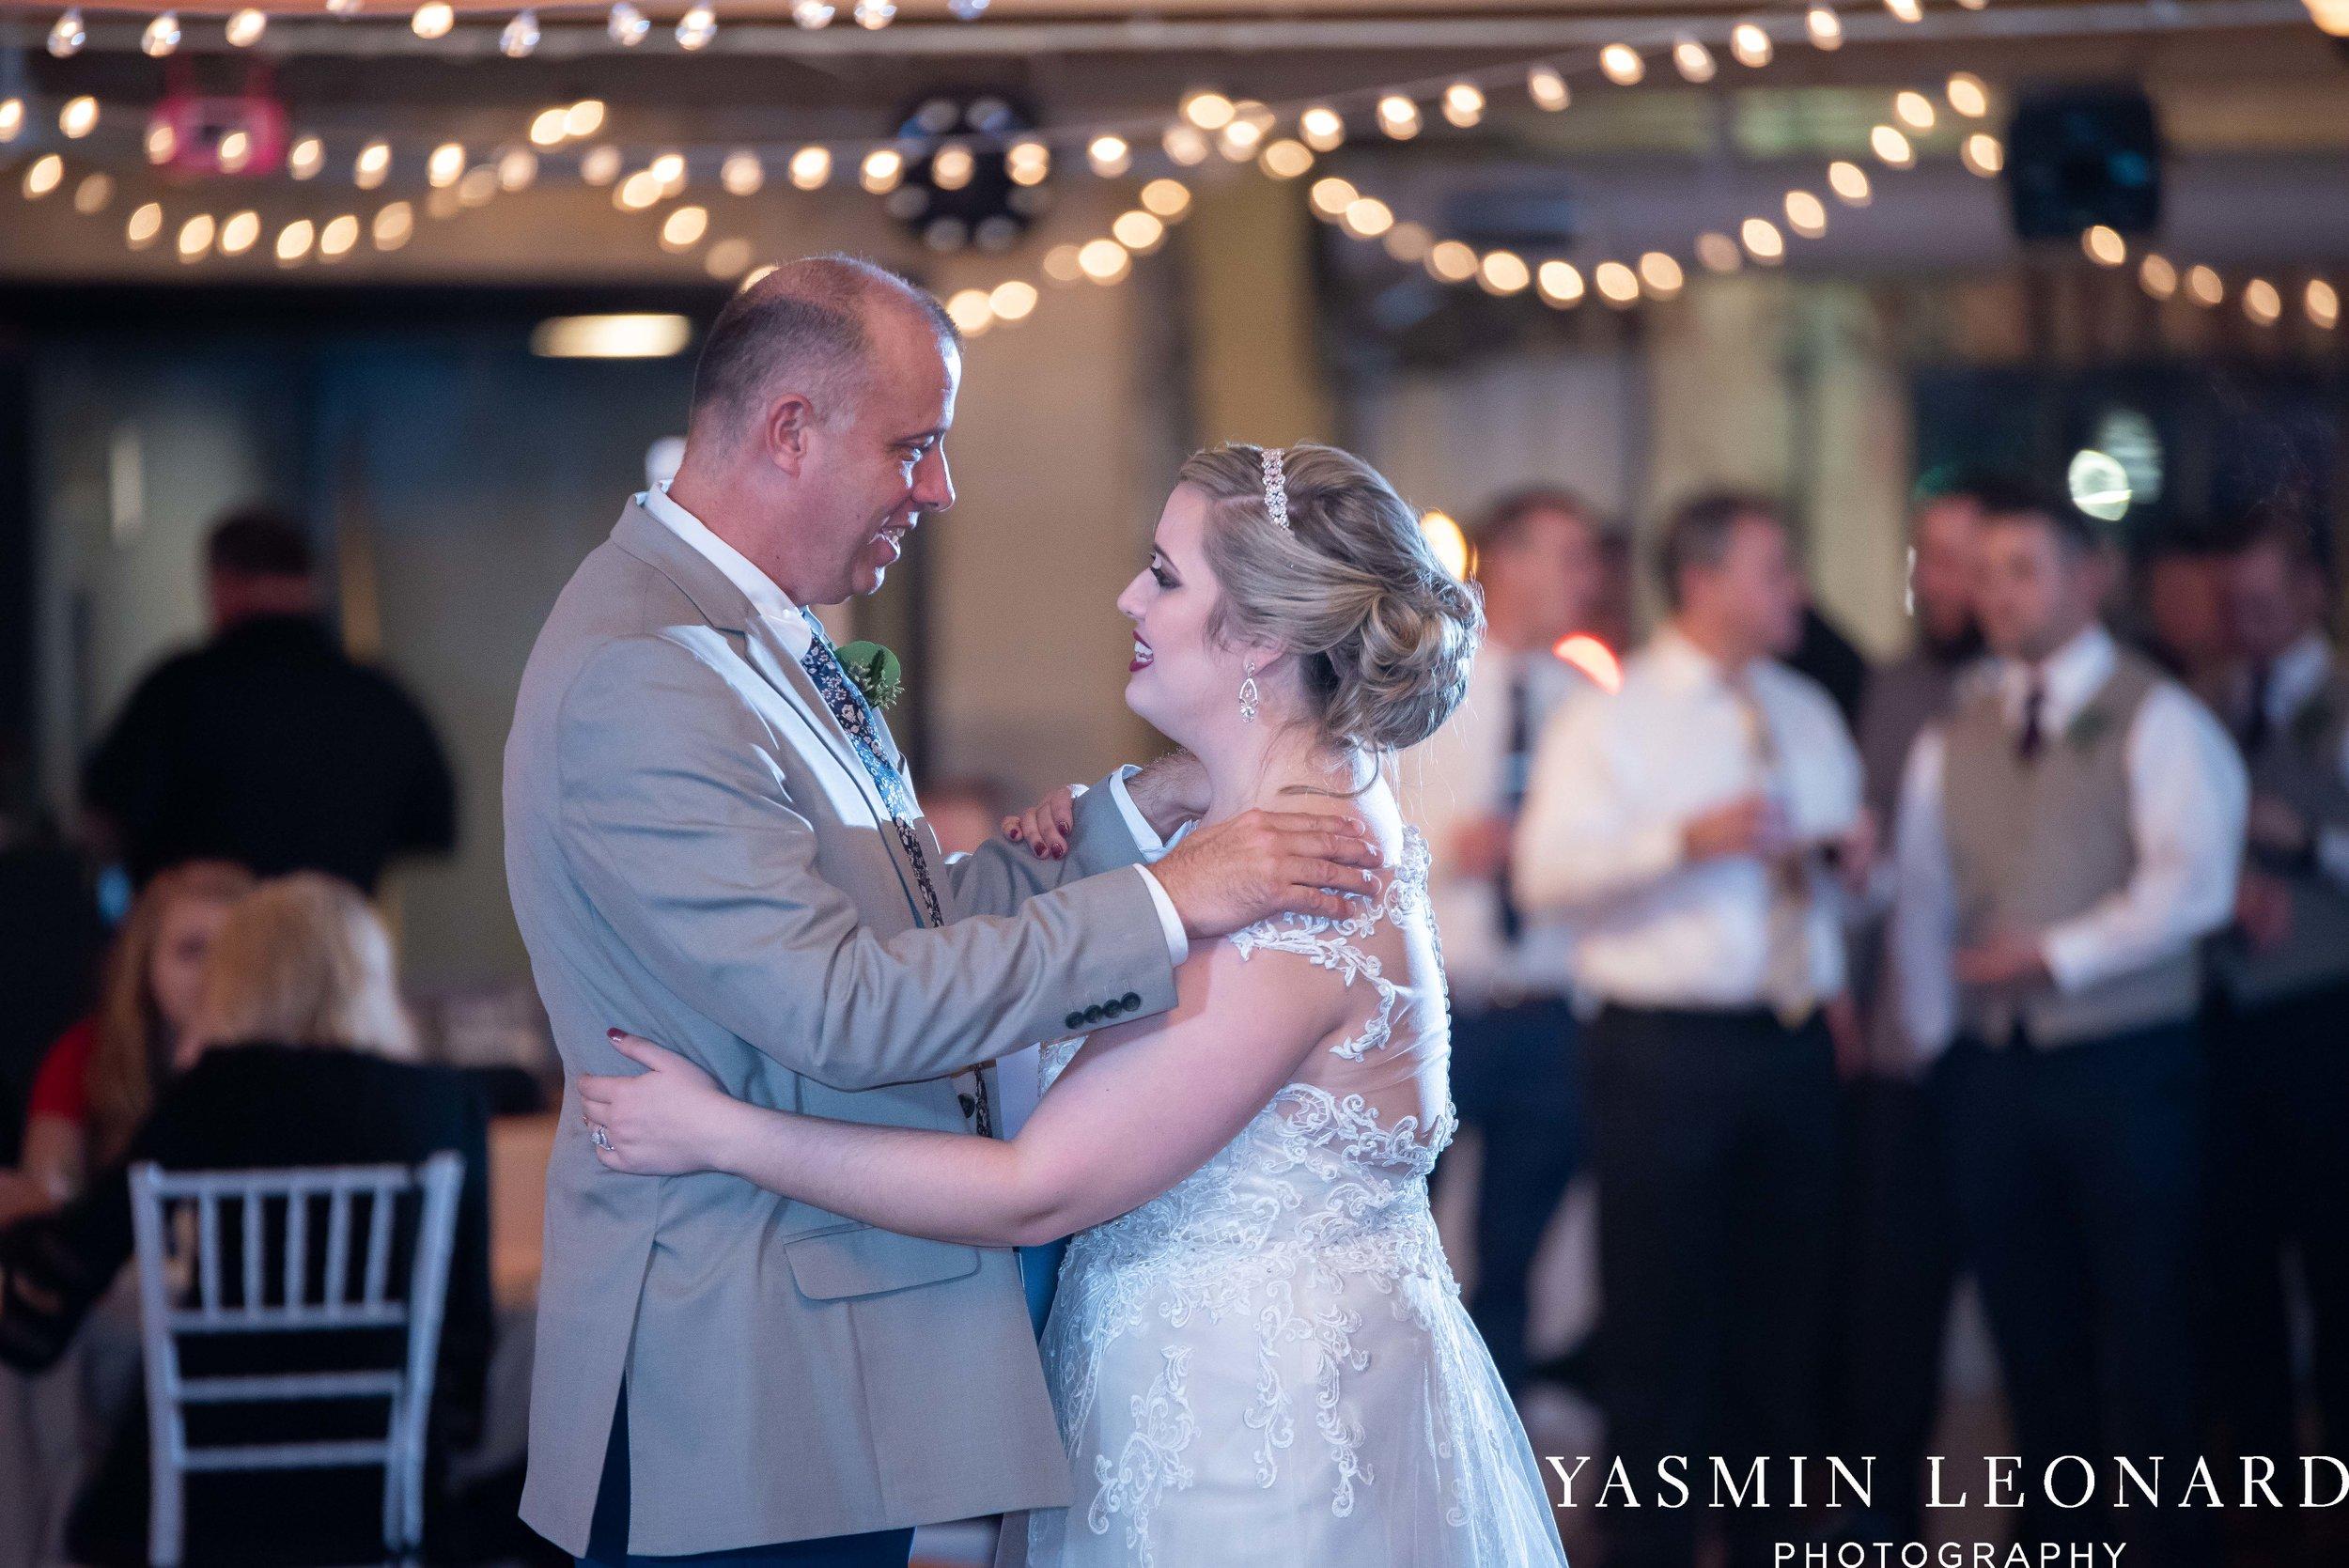 Rebekah and Matt - 105 Worth Event Centre - Yasmin Leonard Photography - Asheboro Wedding - NC Wedding - High Point Weddings - Triad Weddings - Winter Wedding-51.jpg